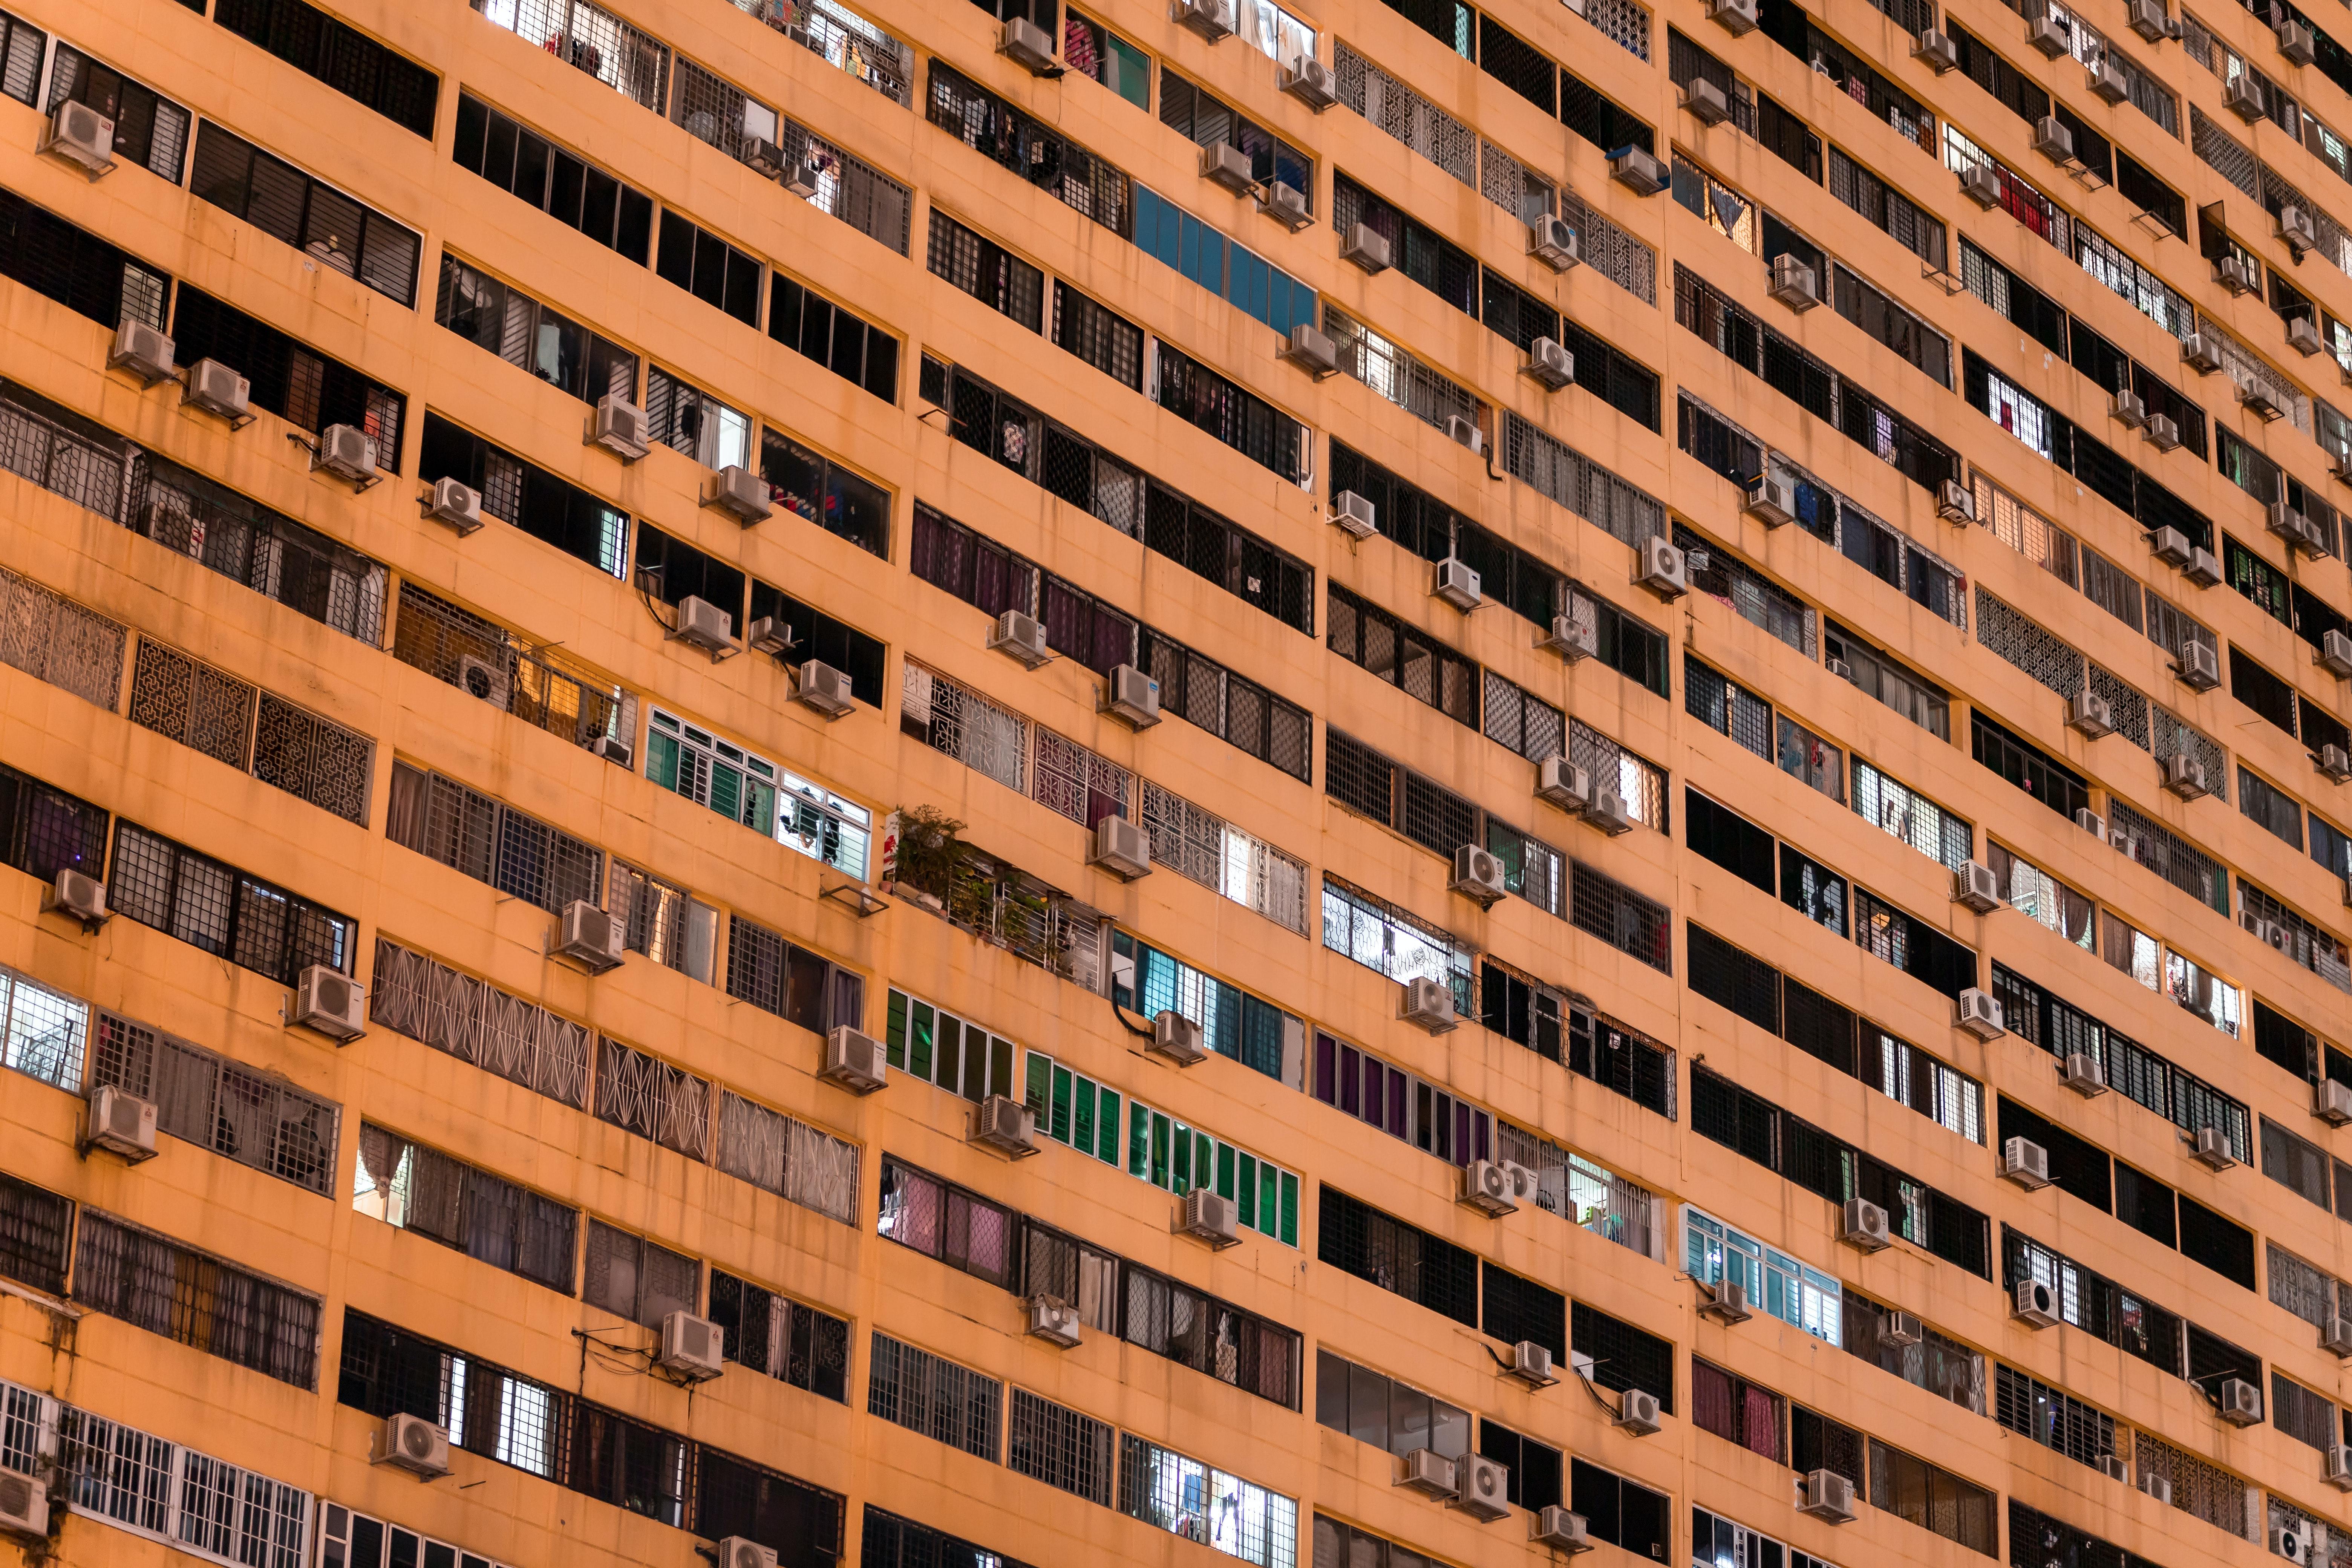 City, Public Housing Authority at the Center of Discrimination Lawsuit